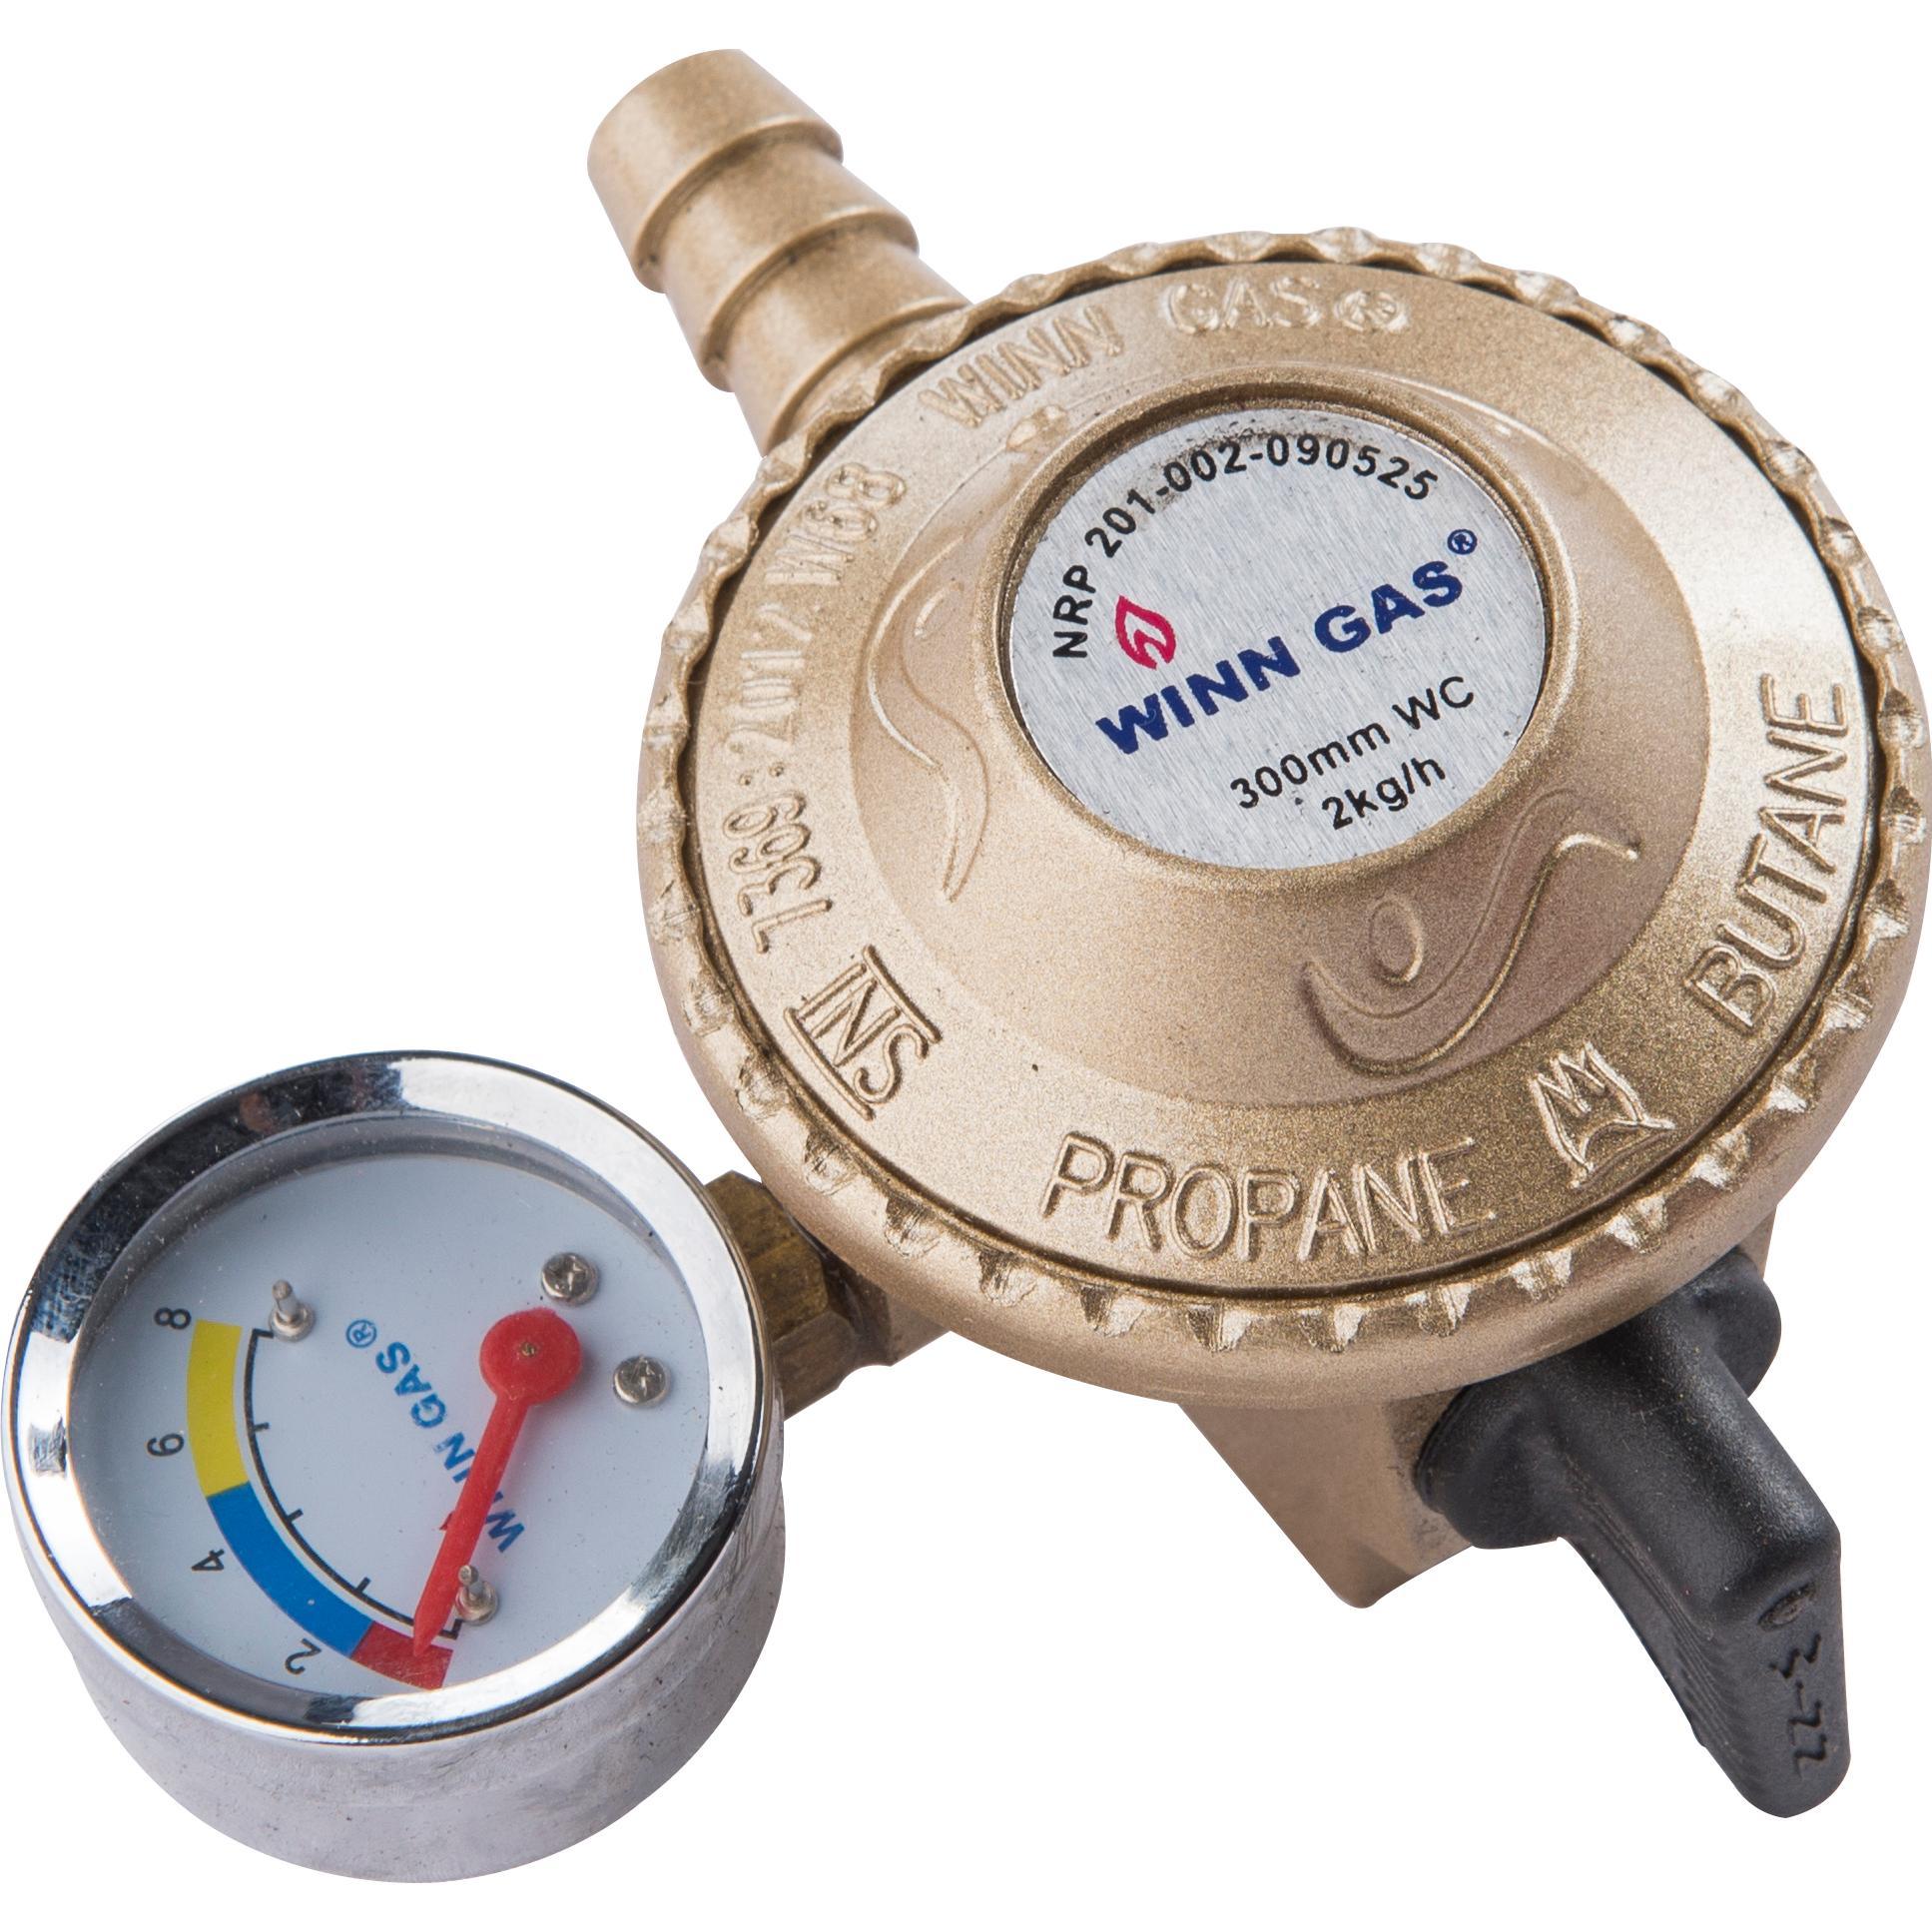 Jual Produk Winn Gas Terlengkap Kompor Dg154 Hitam Regulator Tekanan Rendah W68m